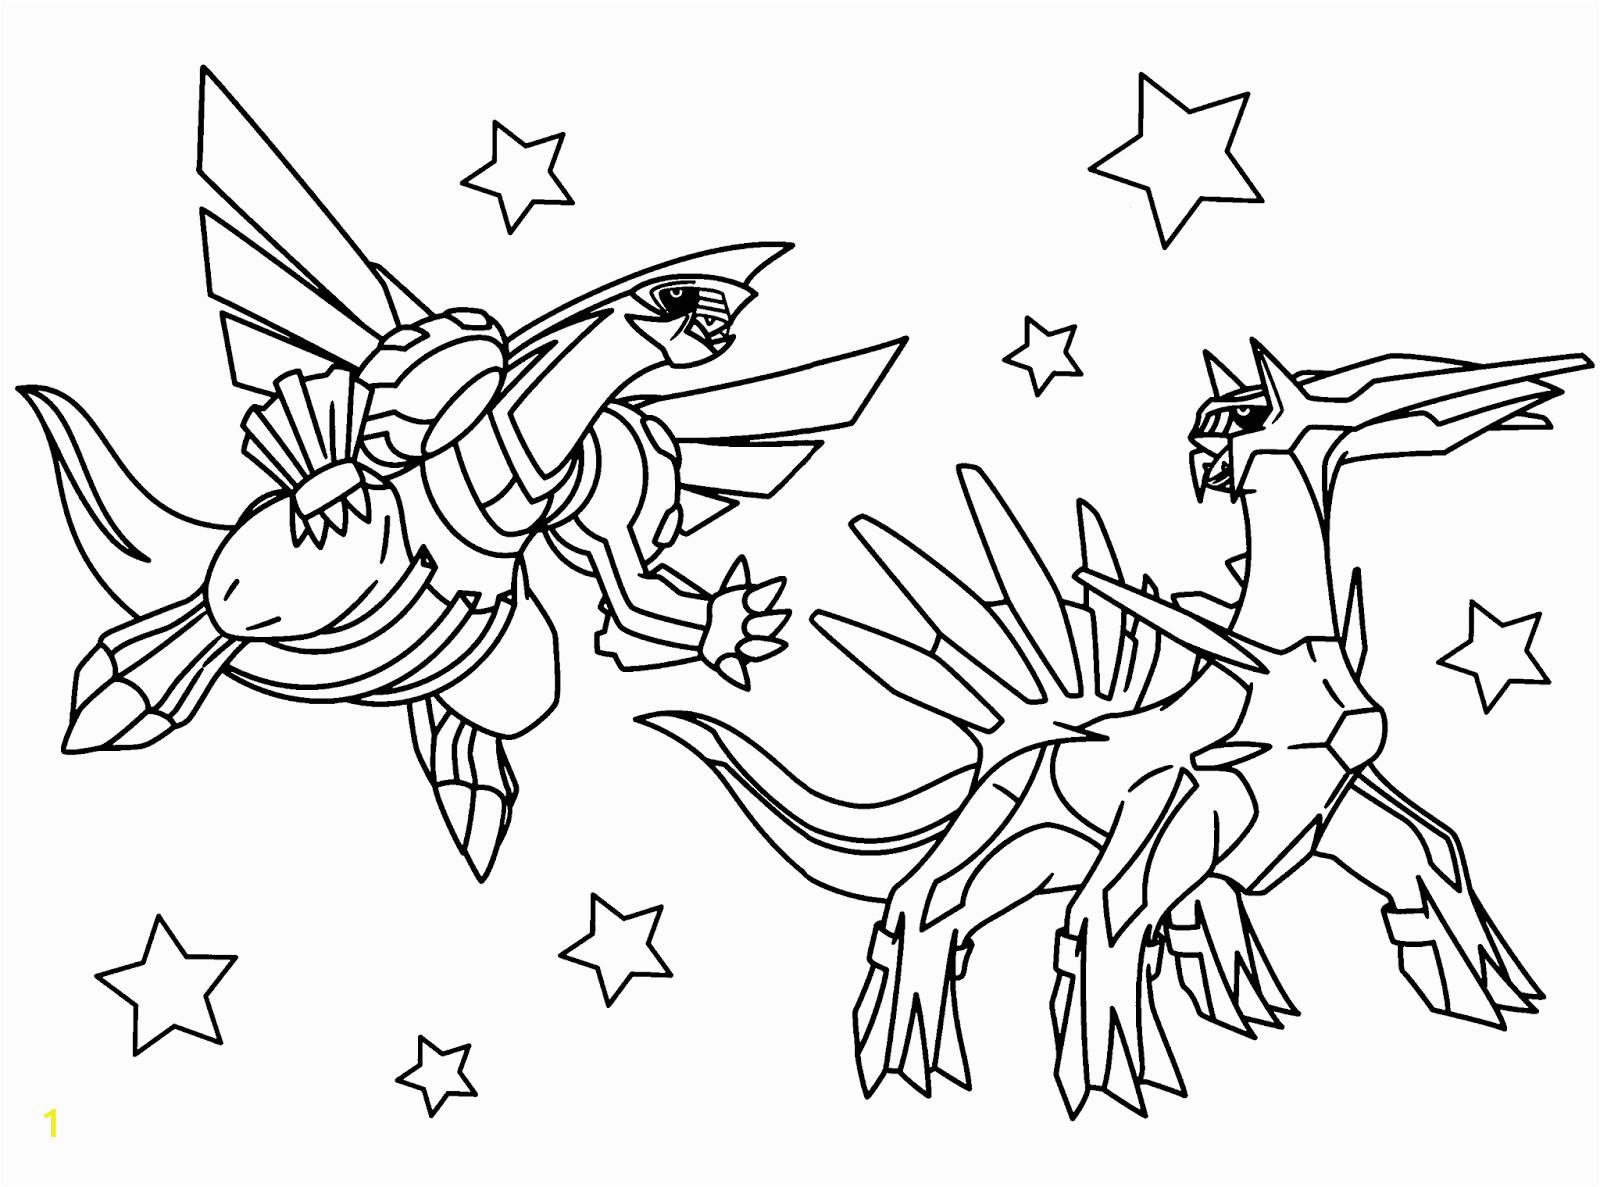 Pokemon Dialga and Palkia Coloring Pages Free Legendary Pokemon Coloring Pages for Kids